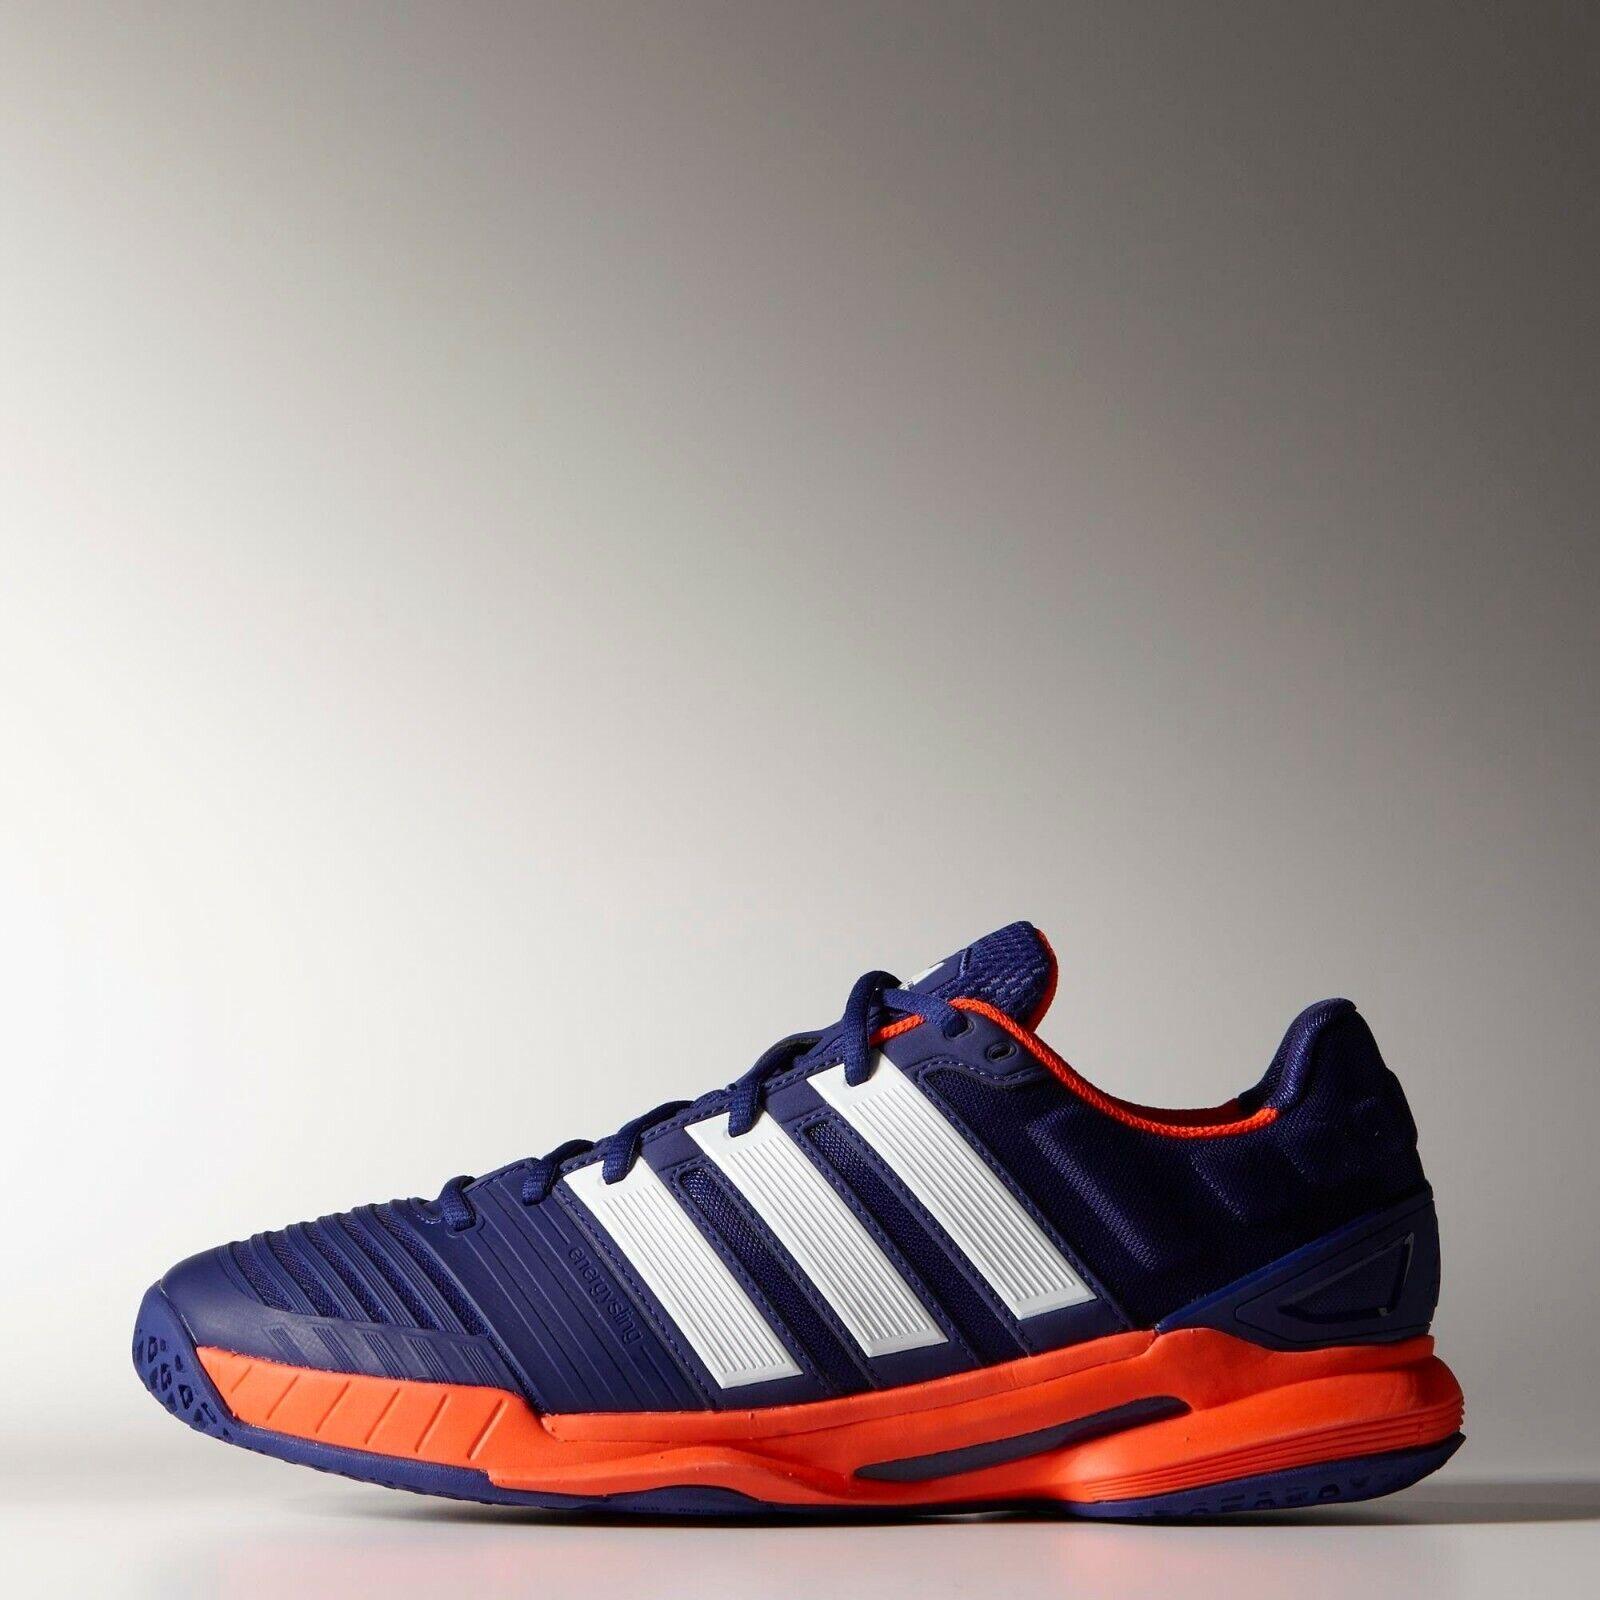 M29548 AdiPower Stabil 11 Men Women Running shoes Sneakers Purple Hit